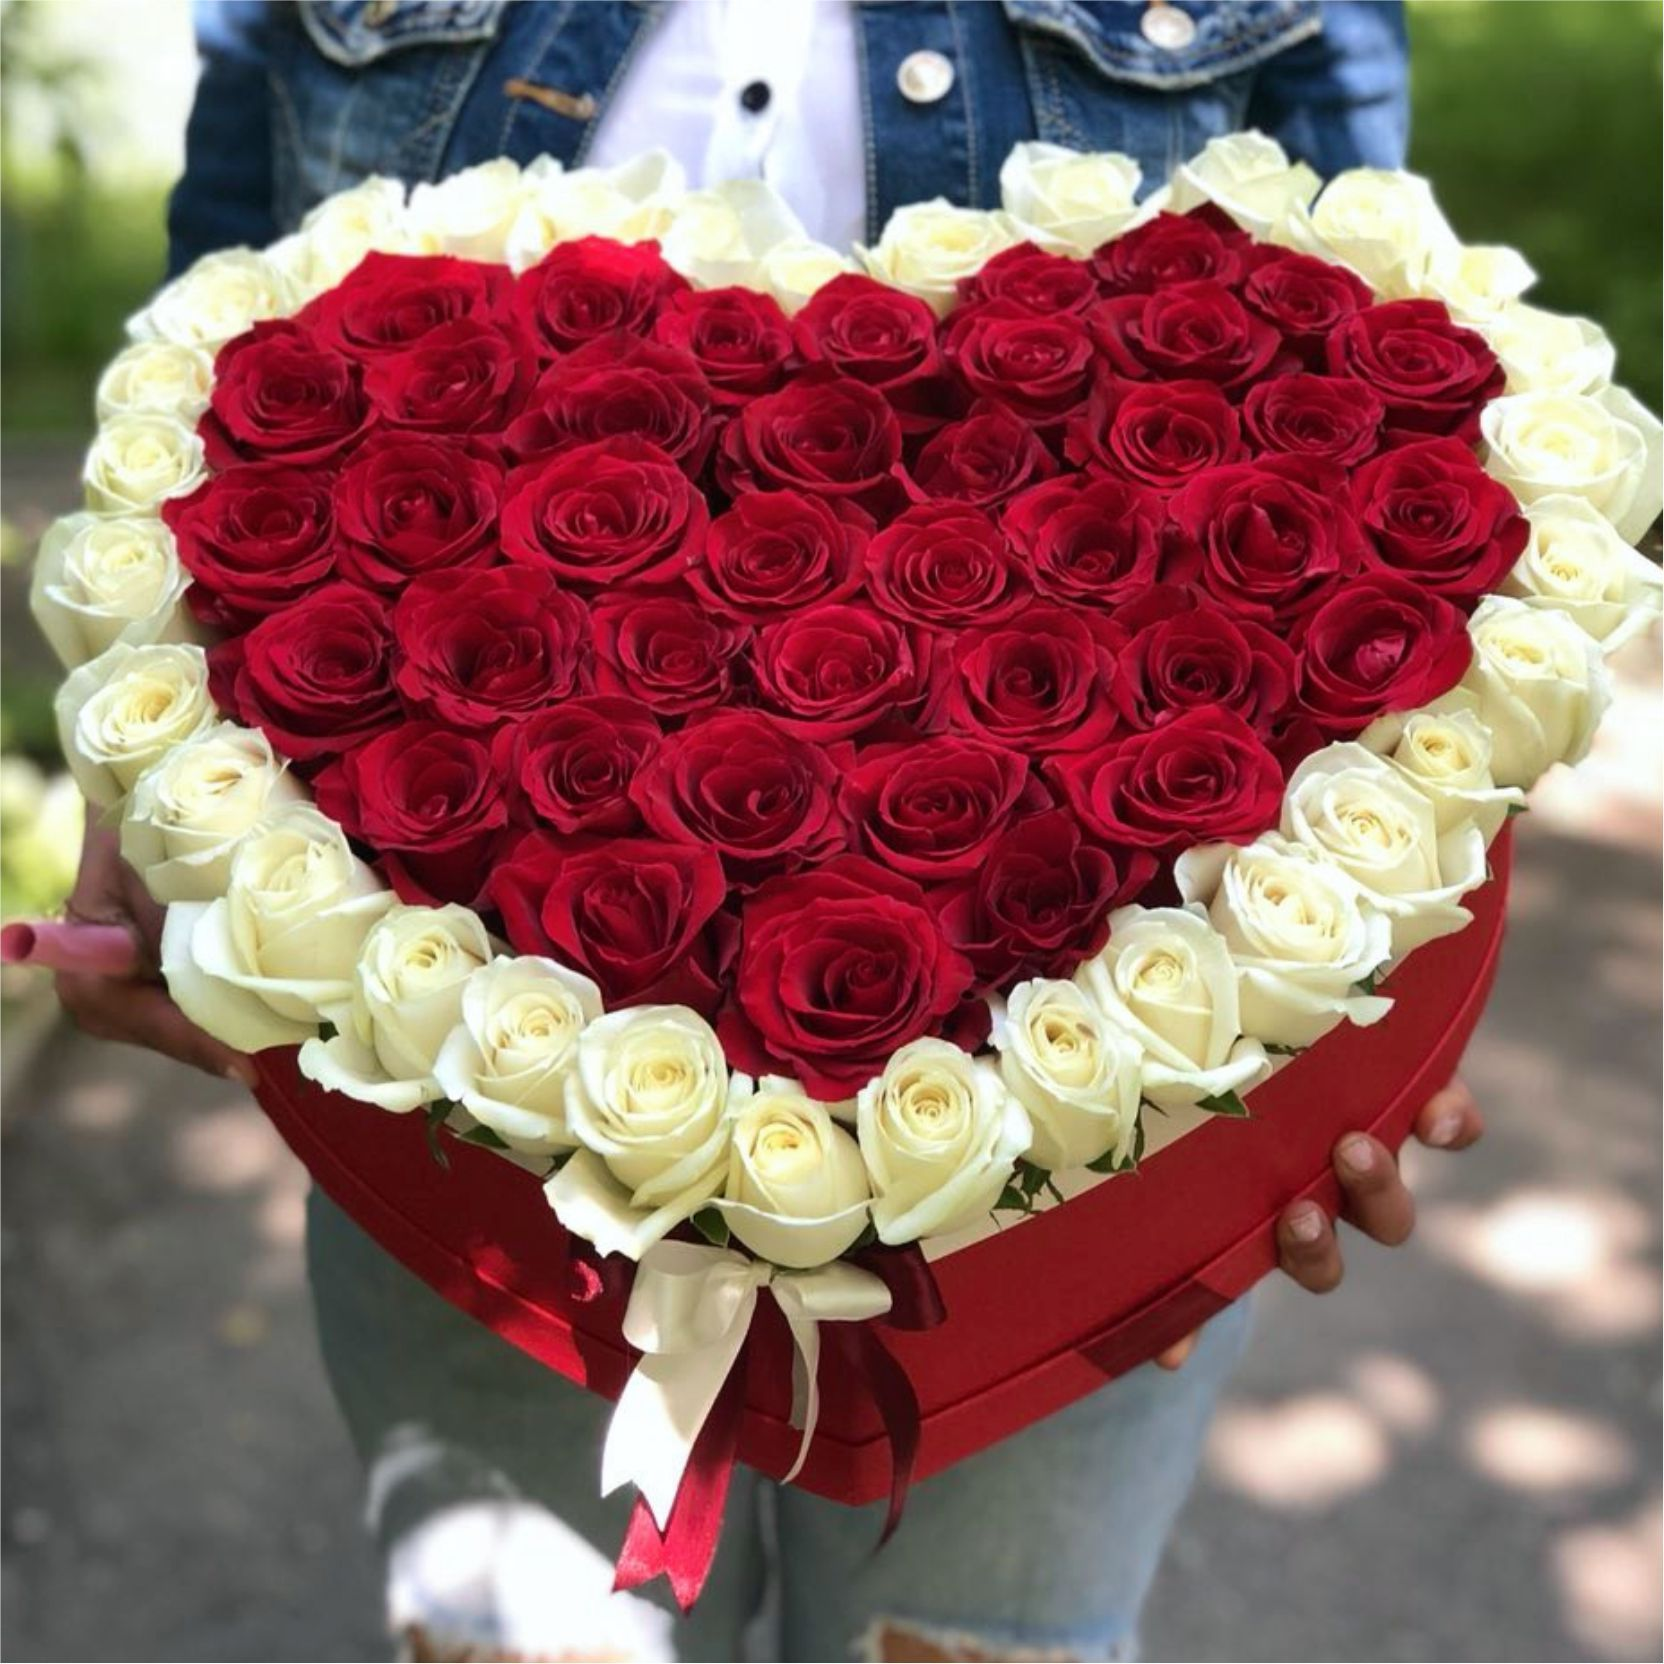 Букет роз в форме сердца фото